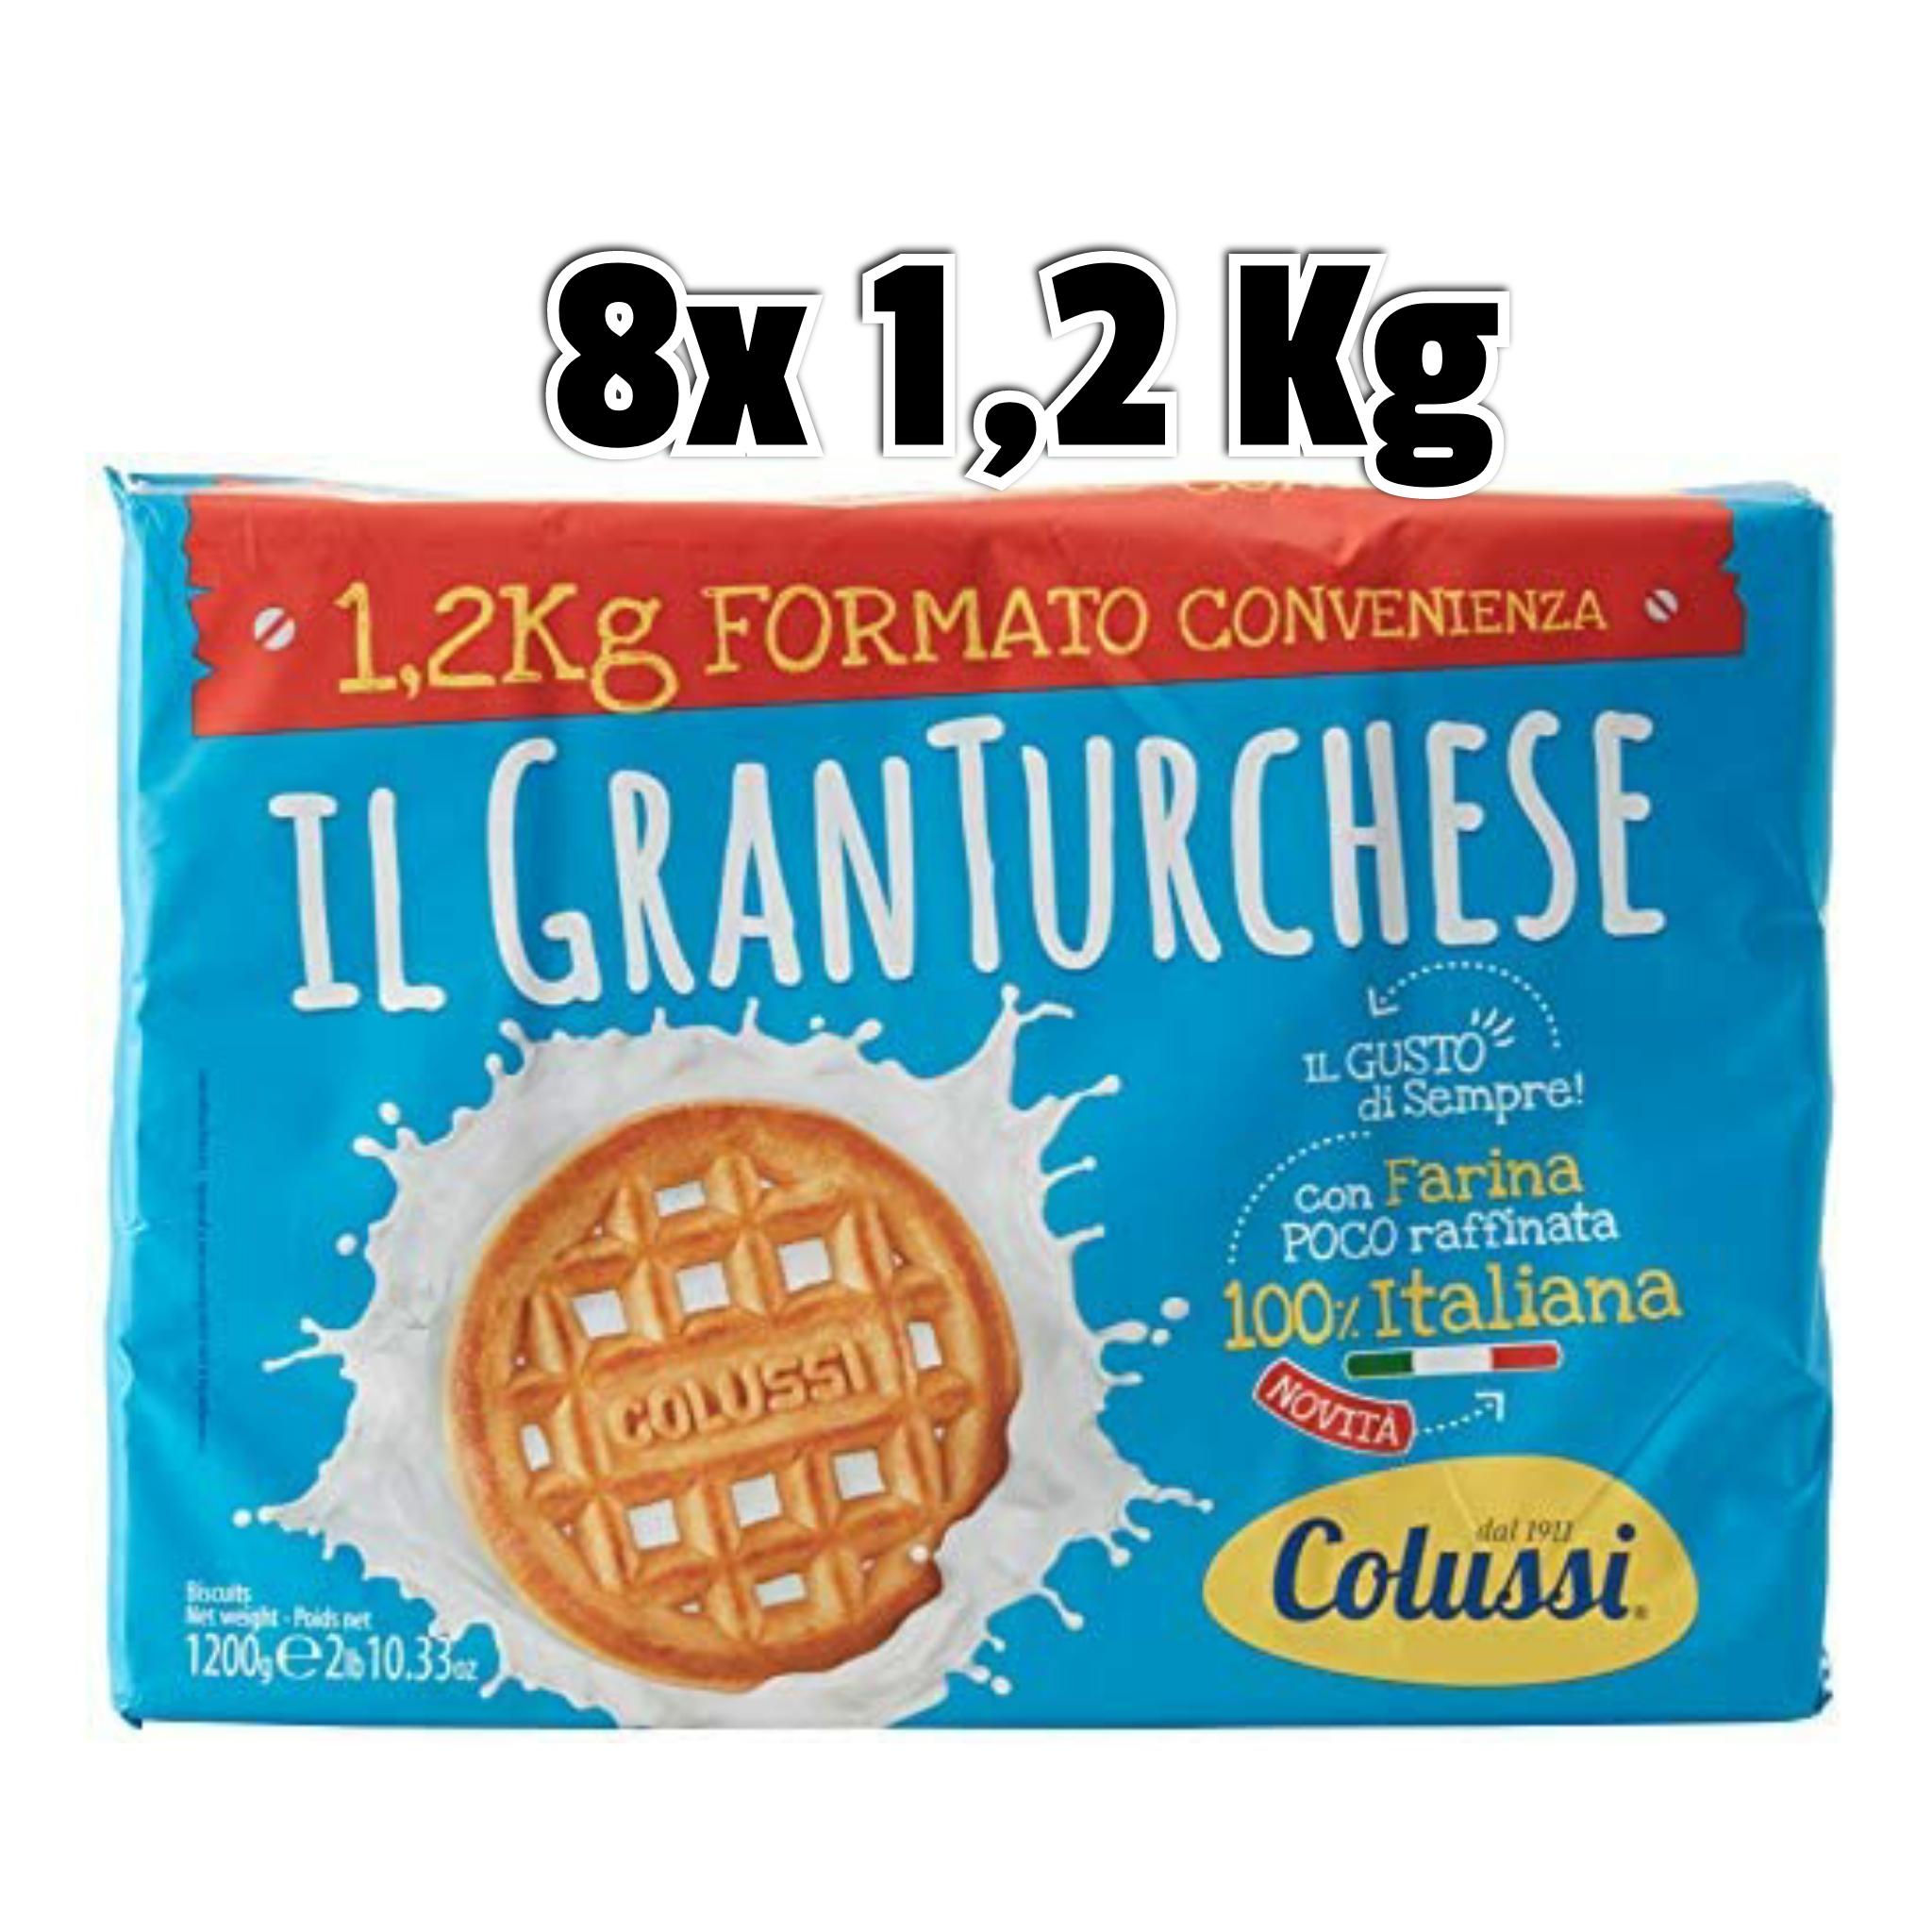 8x 1,2 Kg Colussi Biscotti Il Granturchese